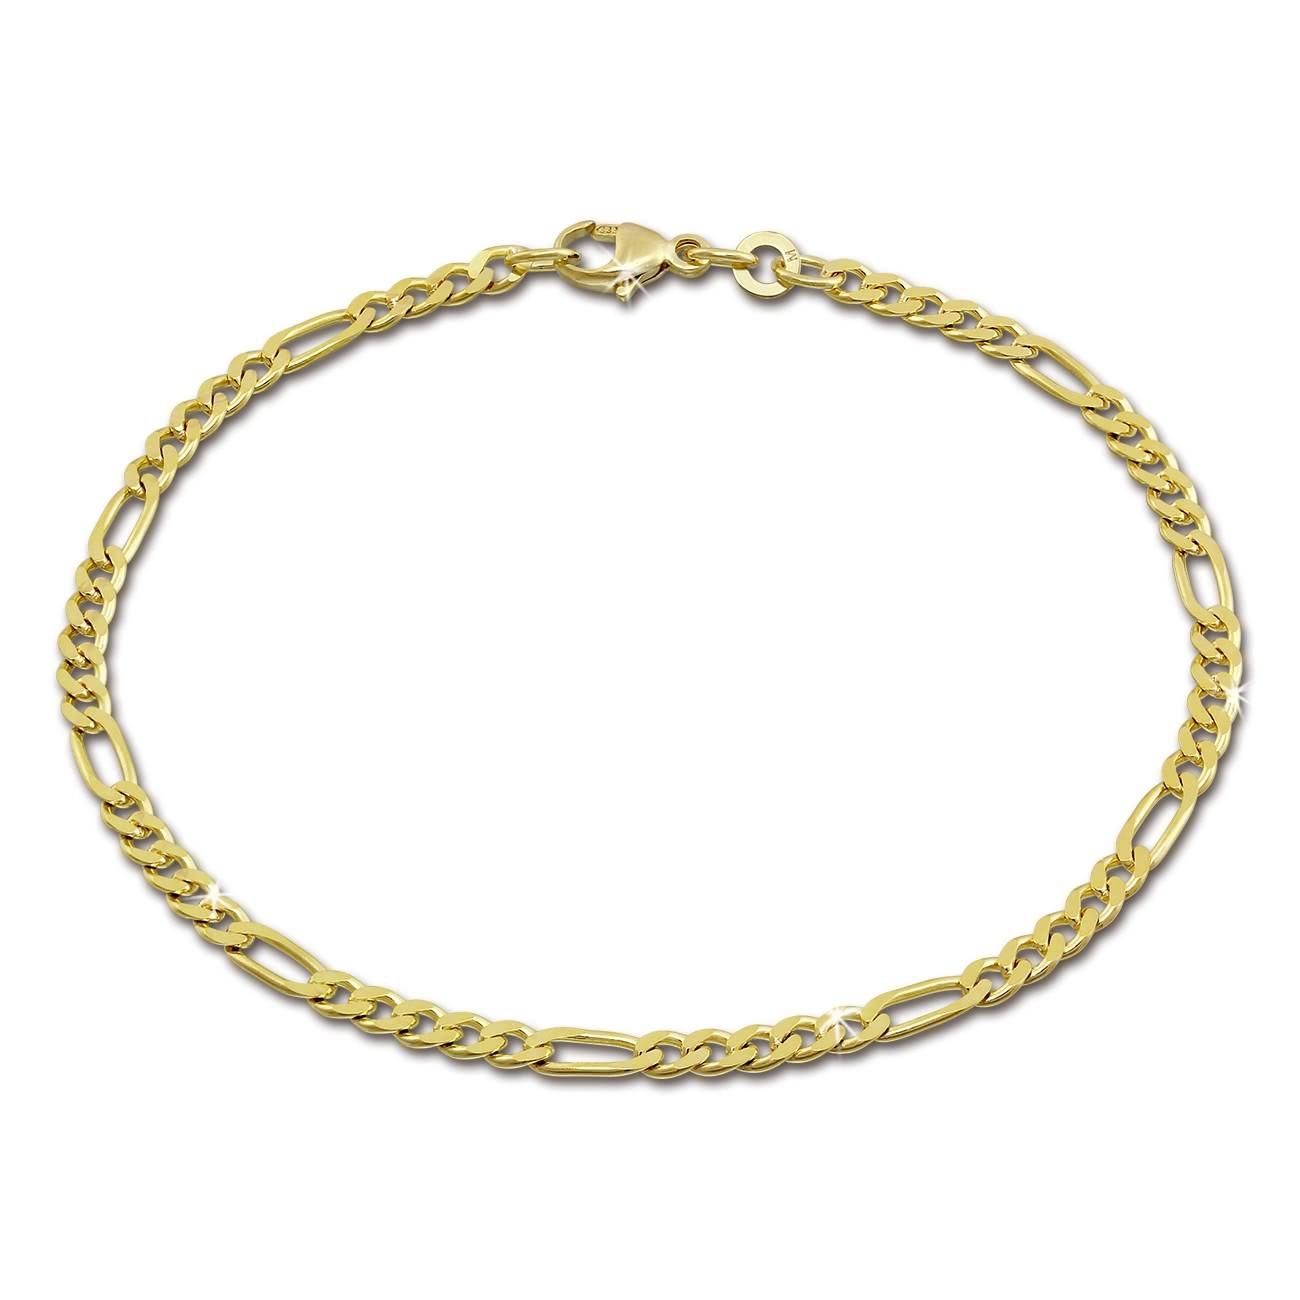 SilberDream Armband Figaro diamantiert 333 Gold 19cm 8 Karat GDA0059Y